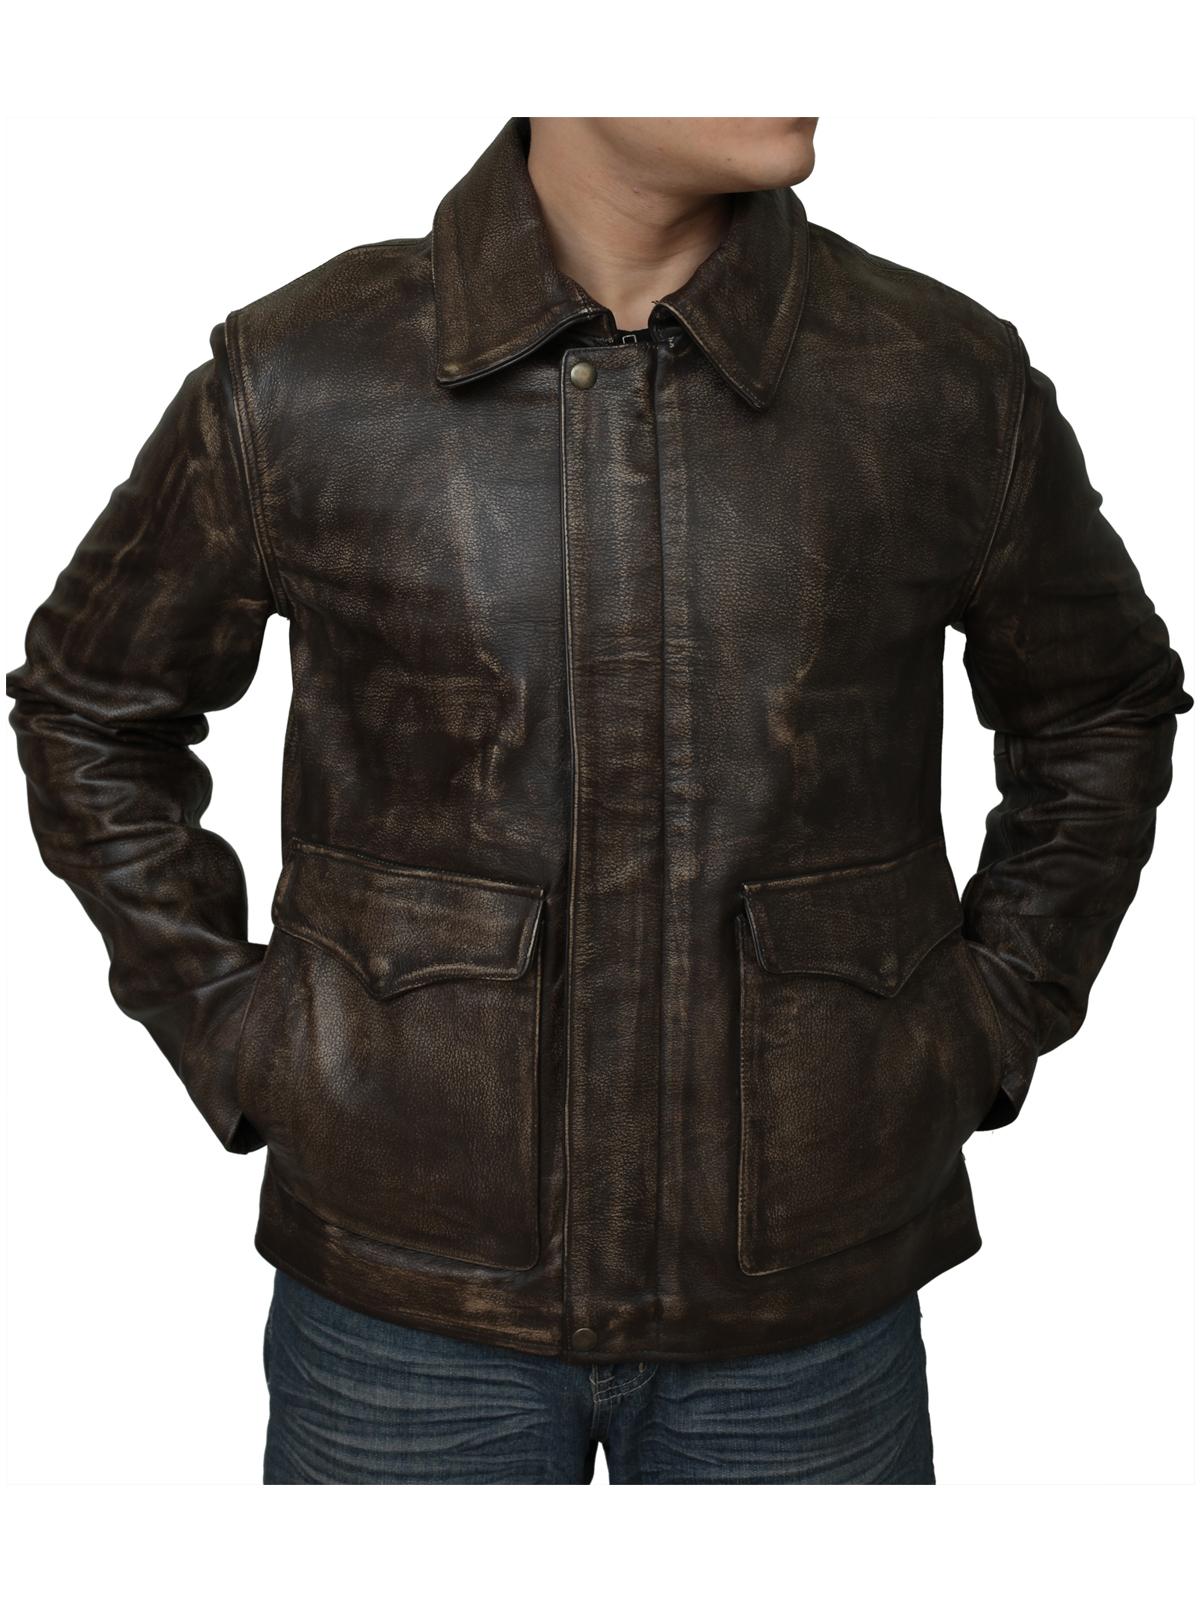 Indiana Jones Distressed Brown Leather Jacket